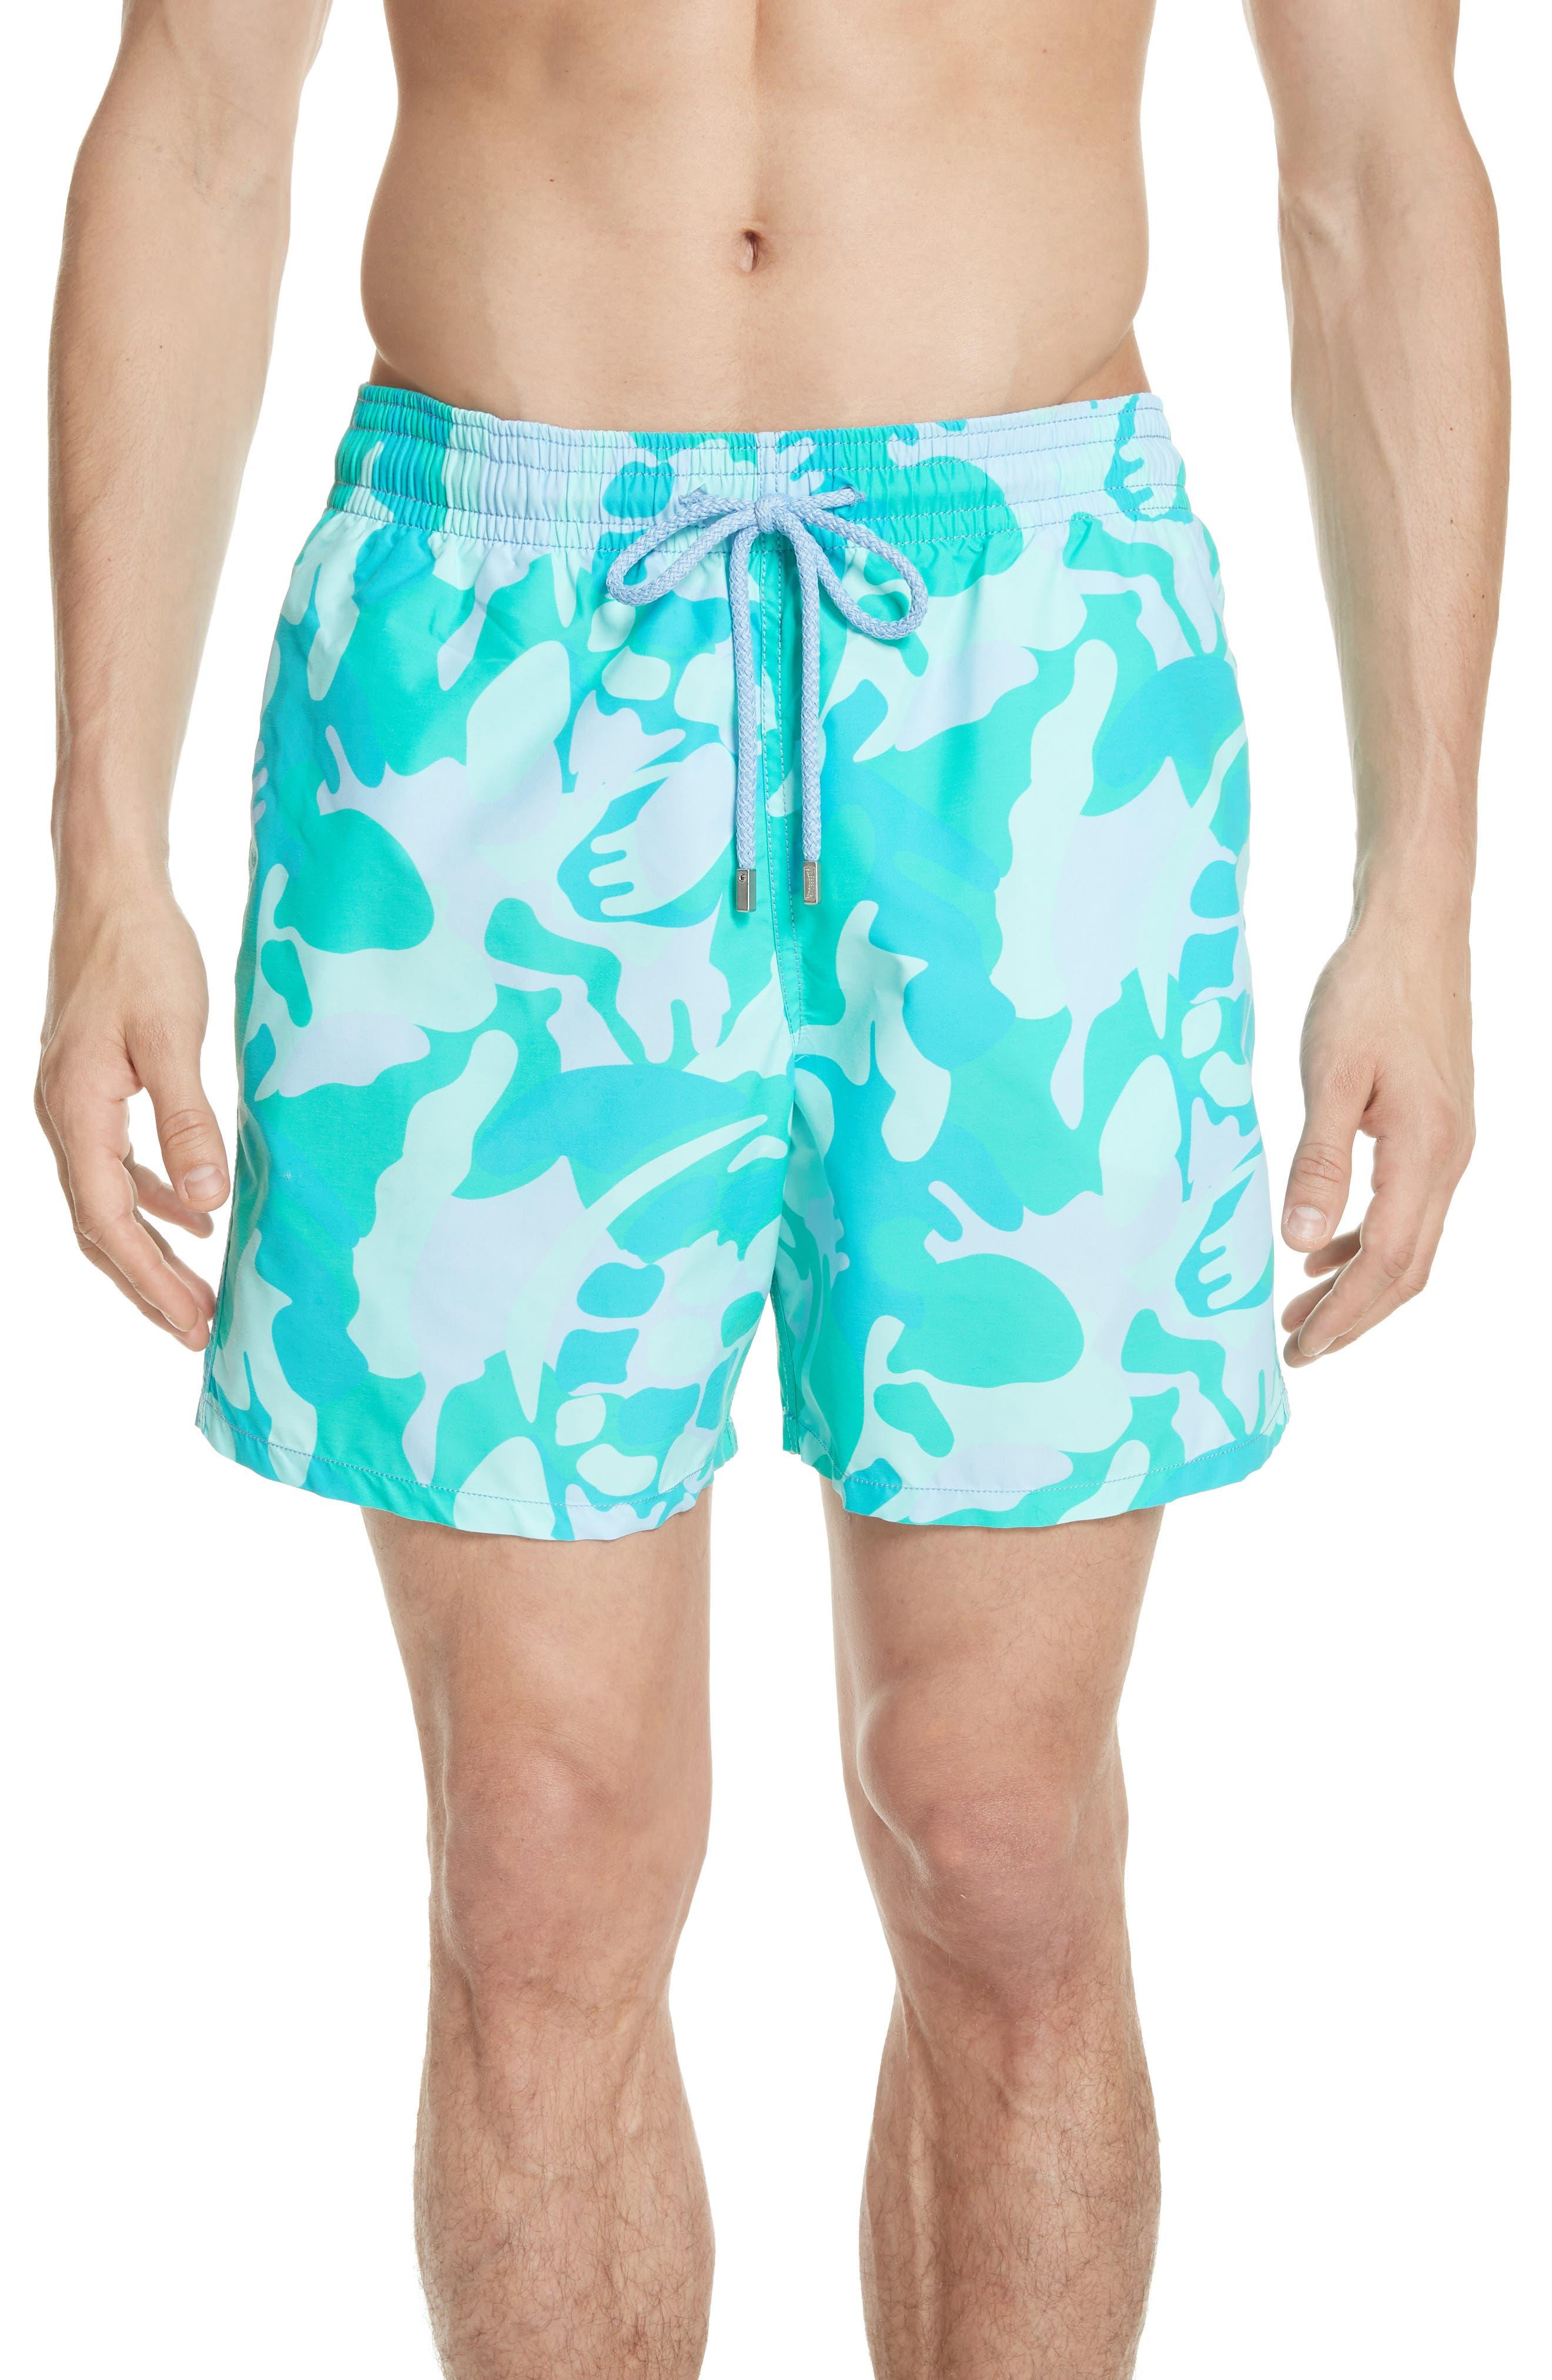 Camo Turtle Print Swim Trunks,                         Main,                         color, 450